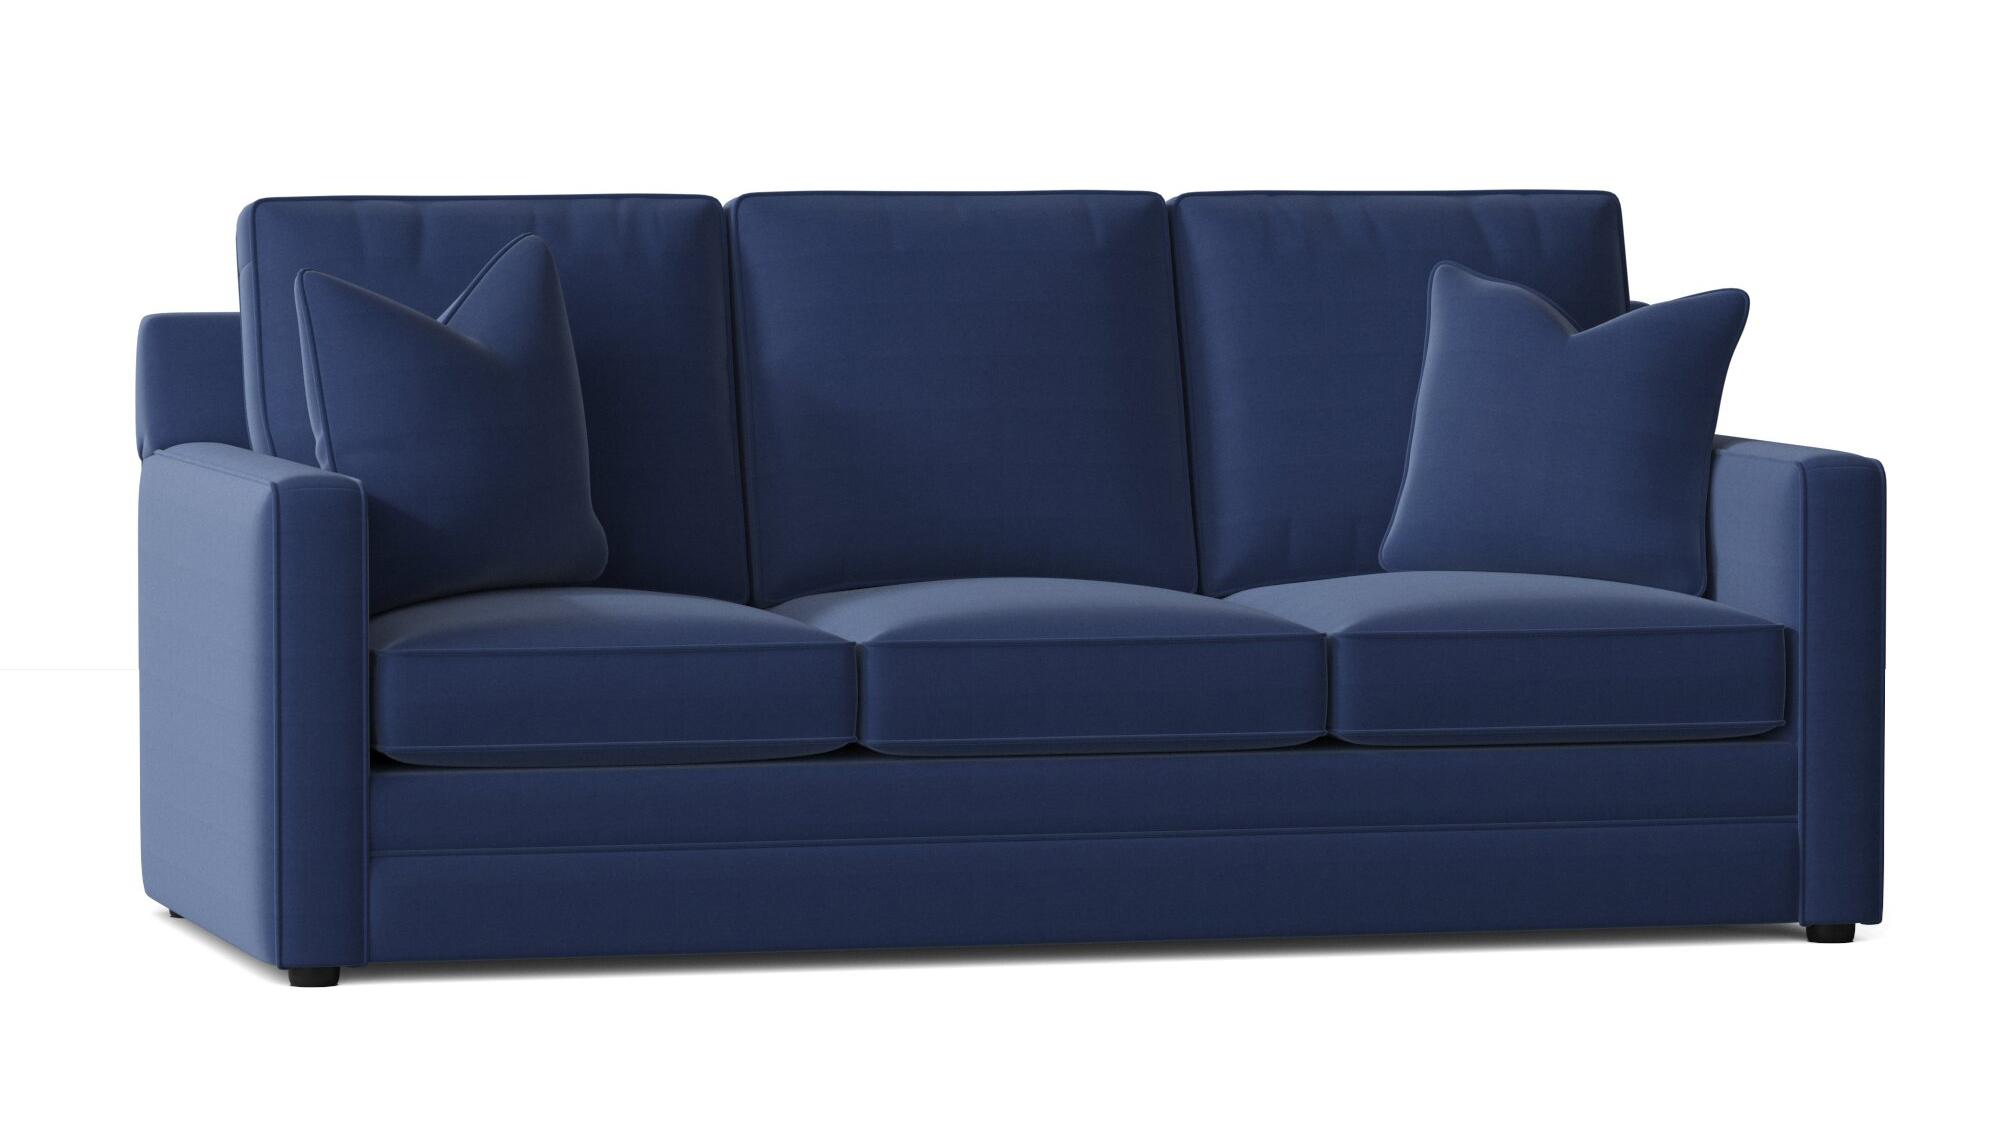 Kelly Clarkson Home Negley Sofa Bed